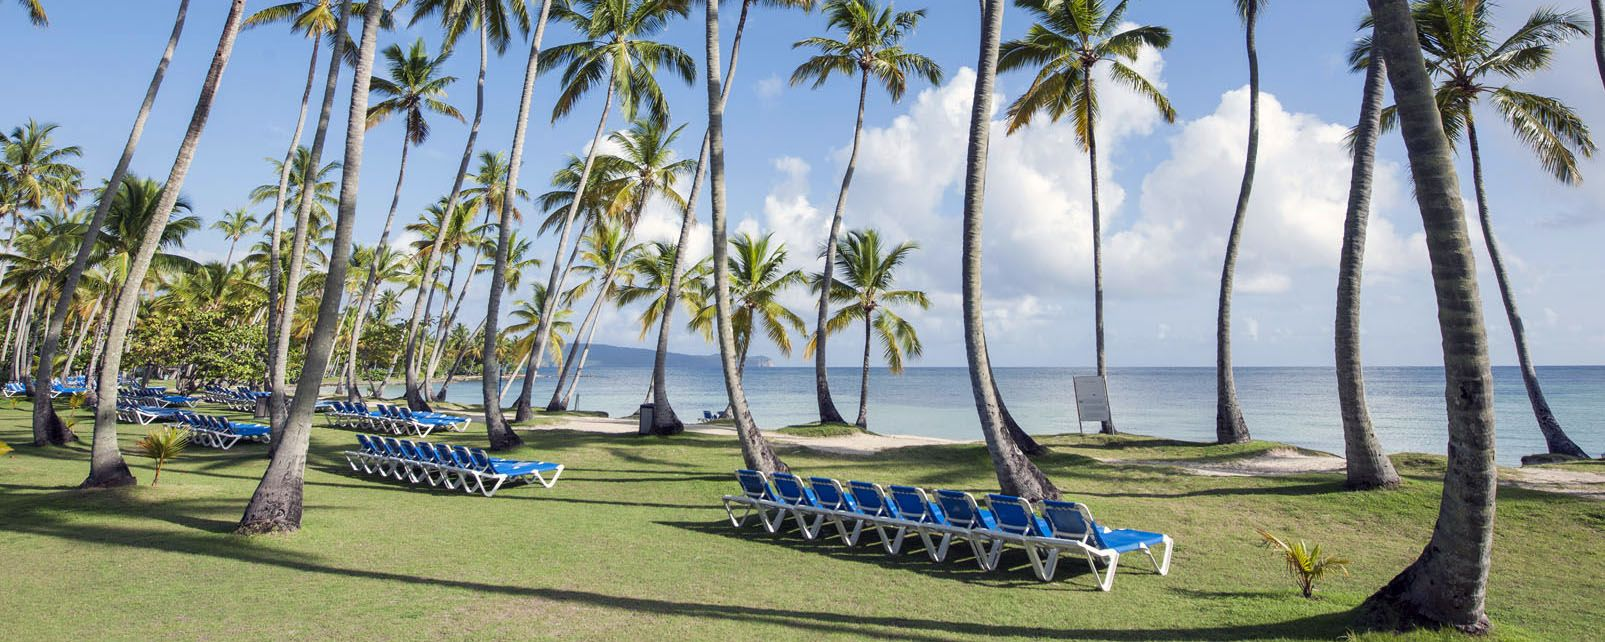 Hotel Grand Paradise Samana Republique Dominicaine